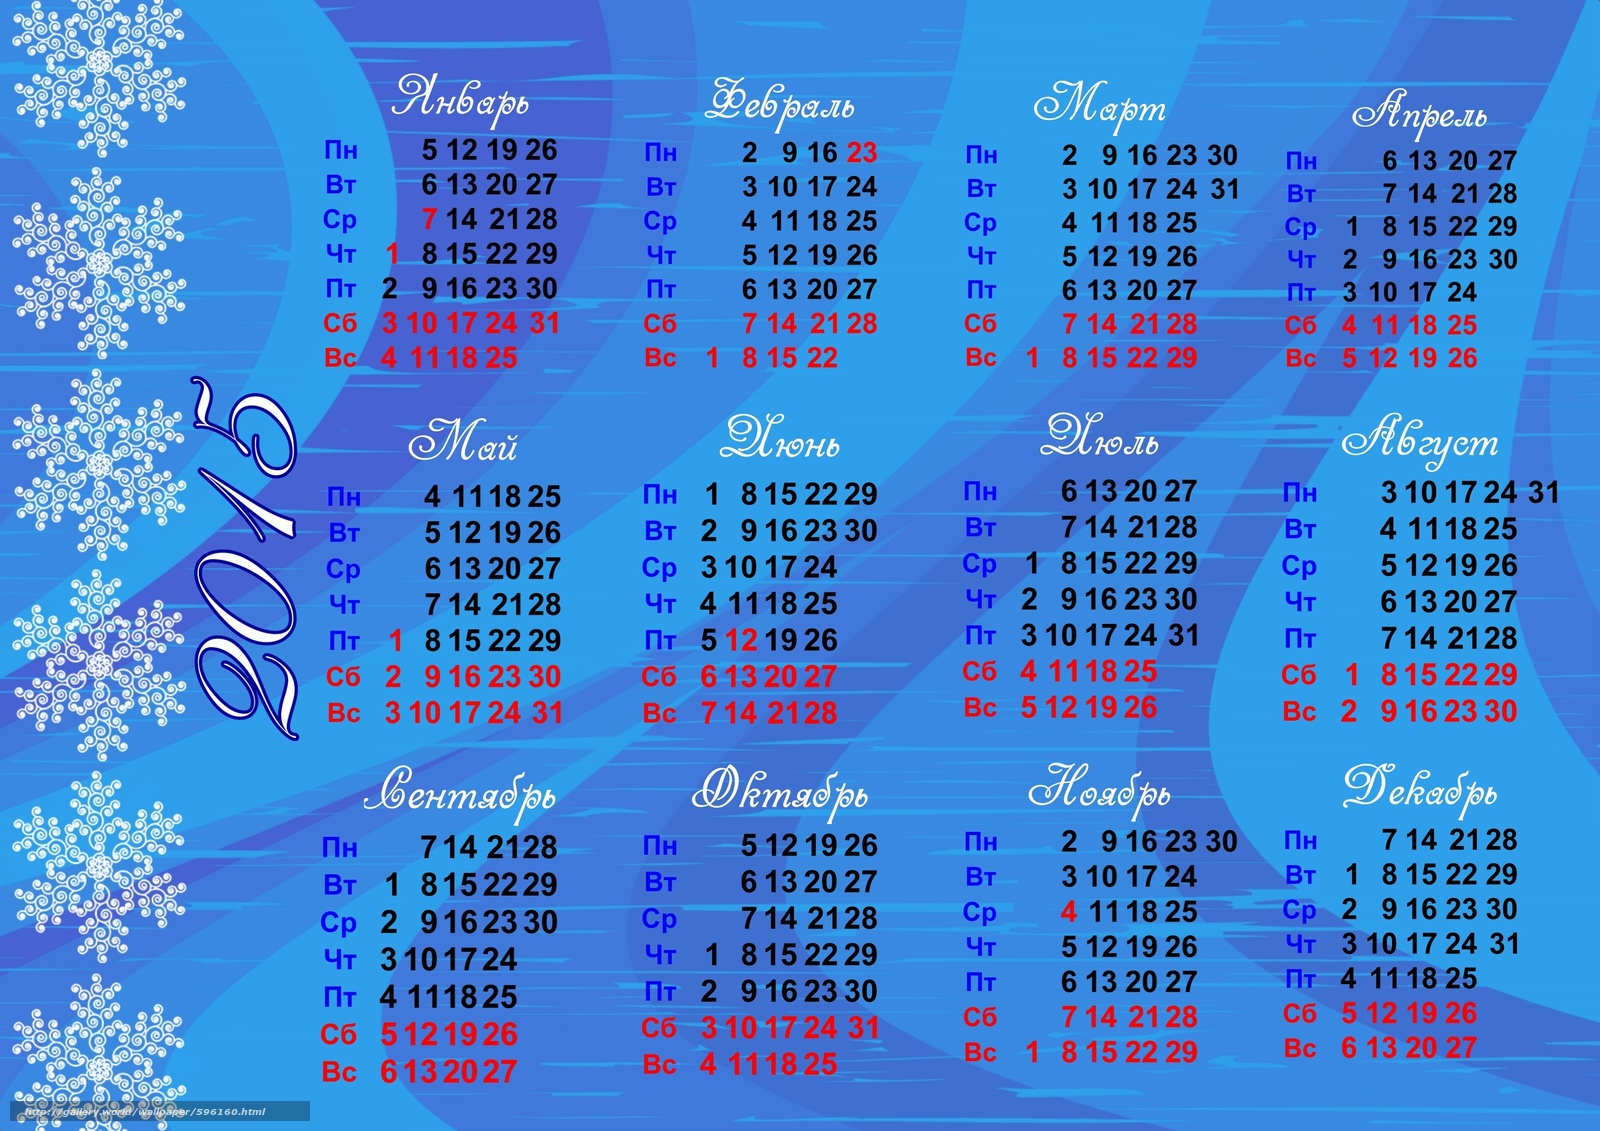 Download wallpaper calendar 2015 Year of the Goat desktop 1600x1131